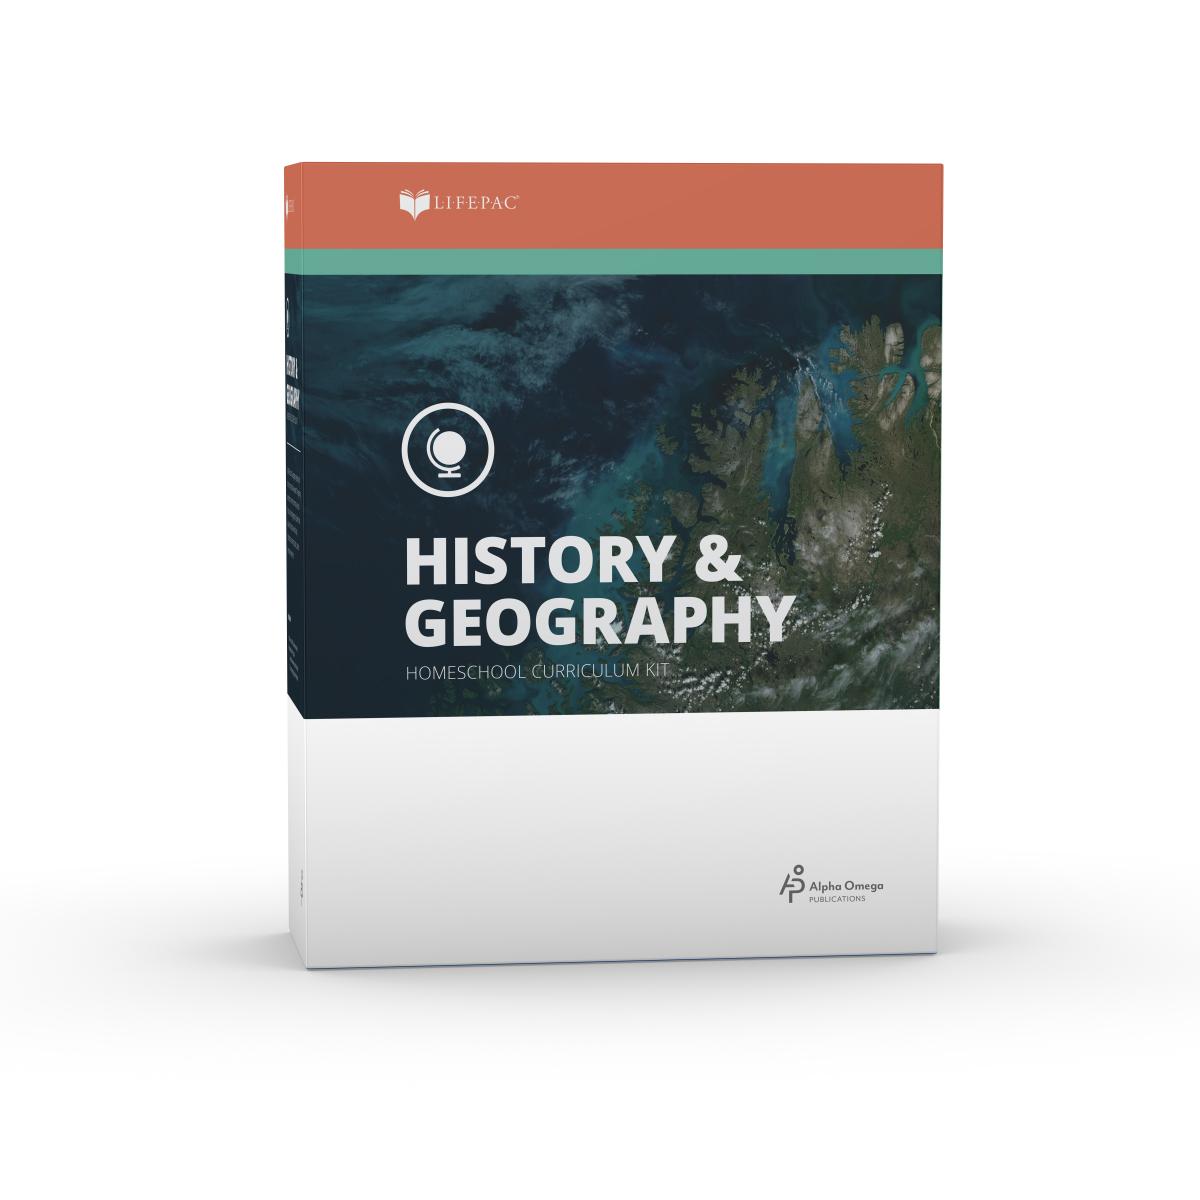 Lifepac 8th Grade History Amp Geography Set